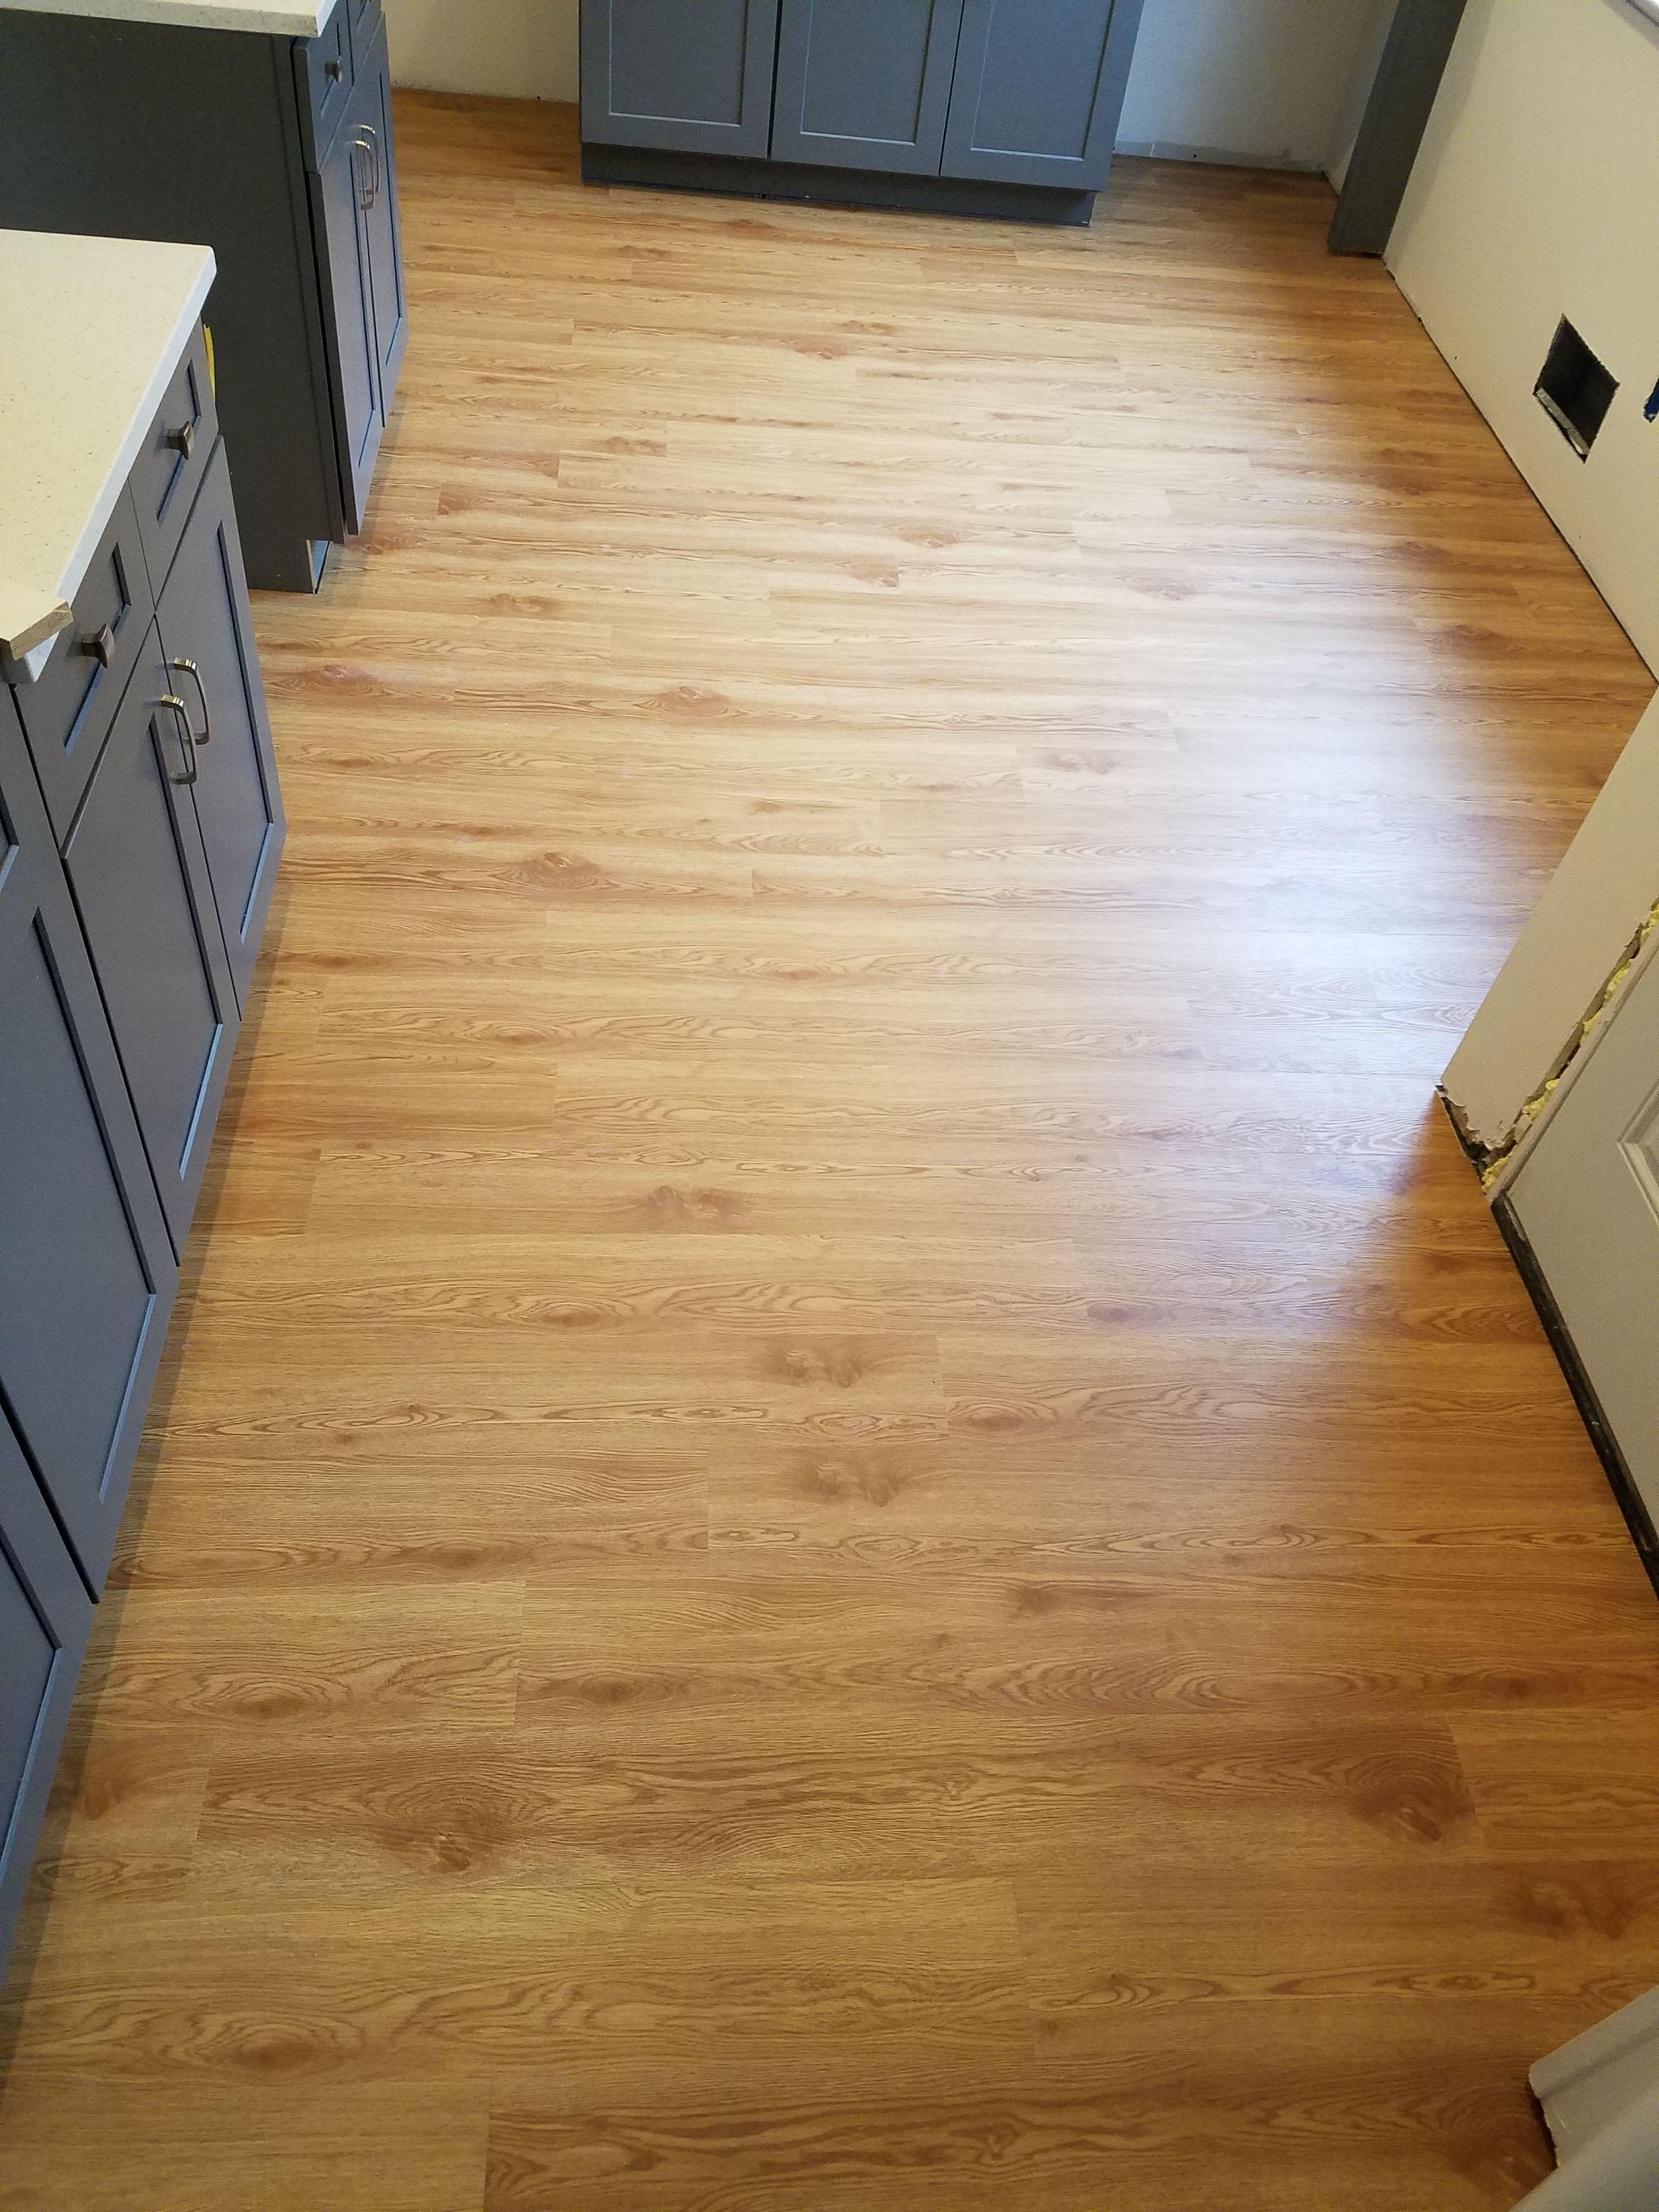 Pin By Rainie Darnell On Kitchen Ideas In 2021 Vinyl Plank Flooring Kitchen Vinyl Flooring Flooring